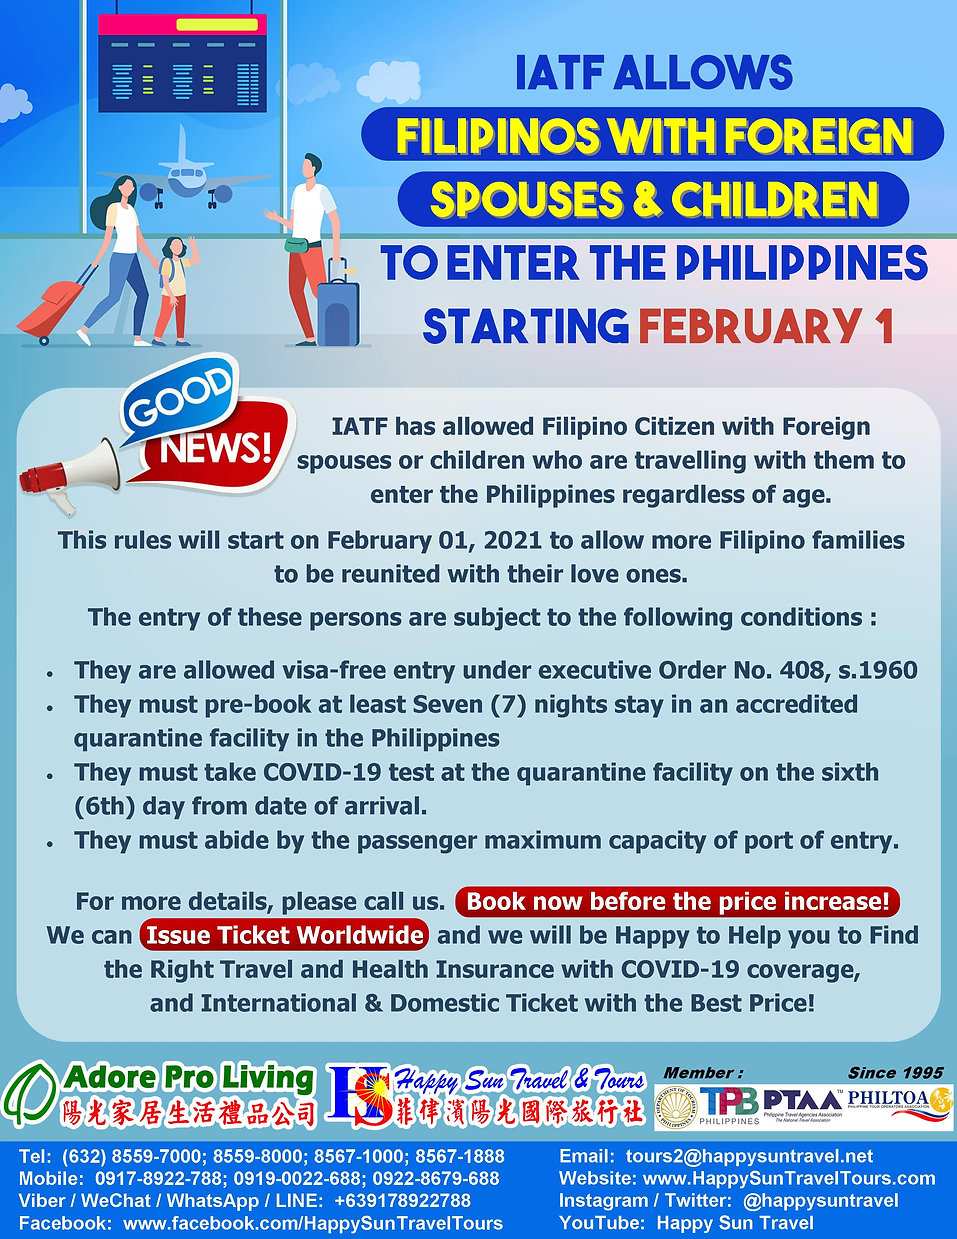 P1_HappySunTravel_FilipnosSpouse&KidsAll